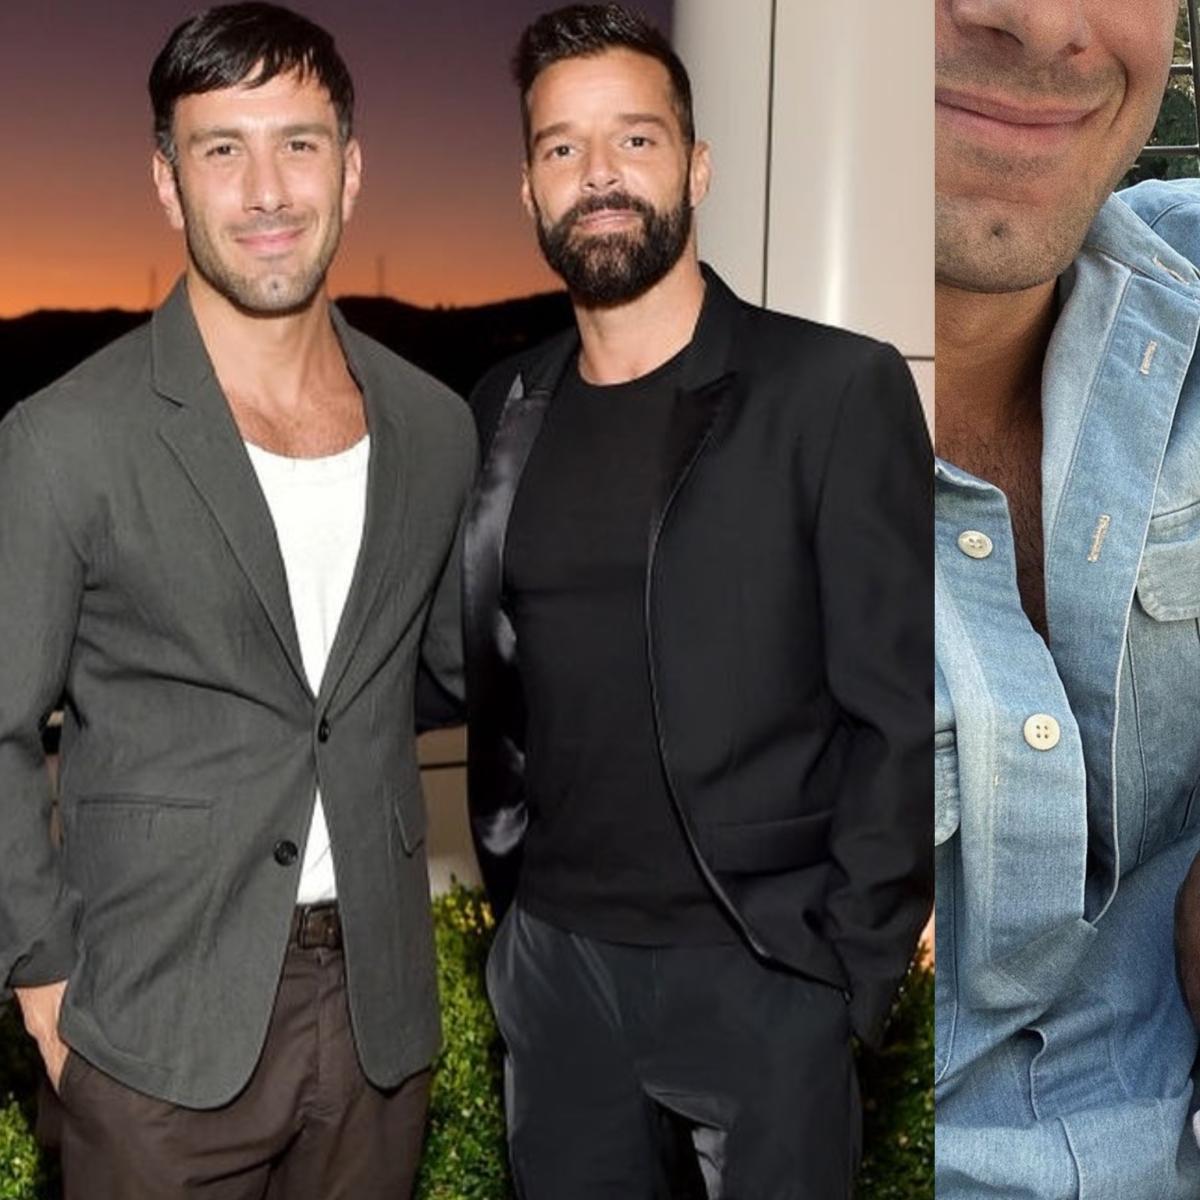 Ricky Martin welcomes fourth child with husband Jwan Yosef